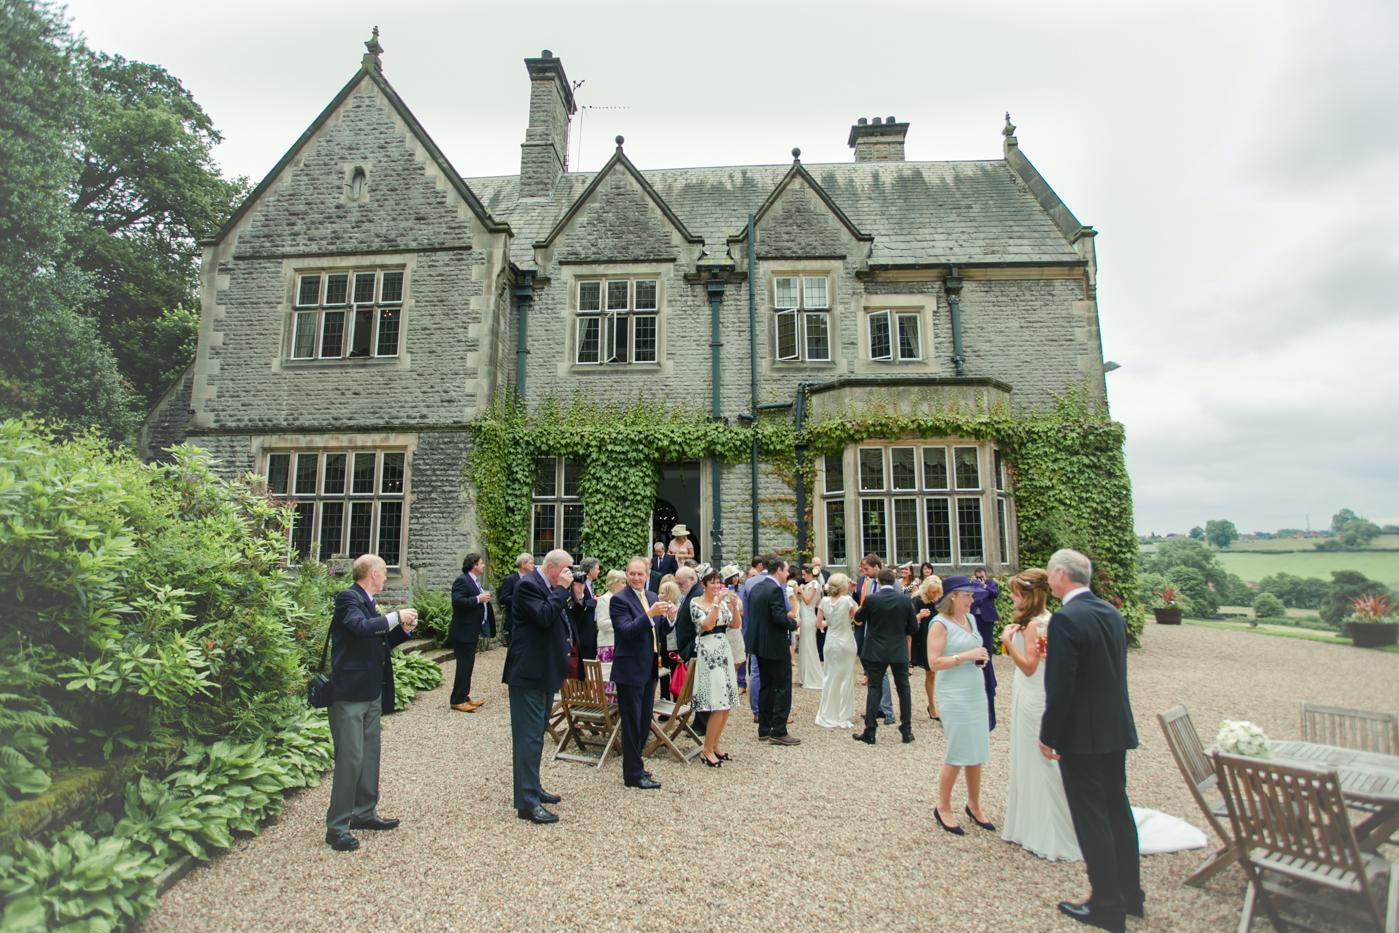 065 - Marie and Richards Fine Art Wedding Photography at Callow Hall by Pamela and Mark Pugh Team MP - www.mpmedia.co.uk -827.JPG